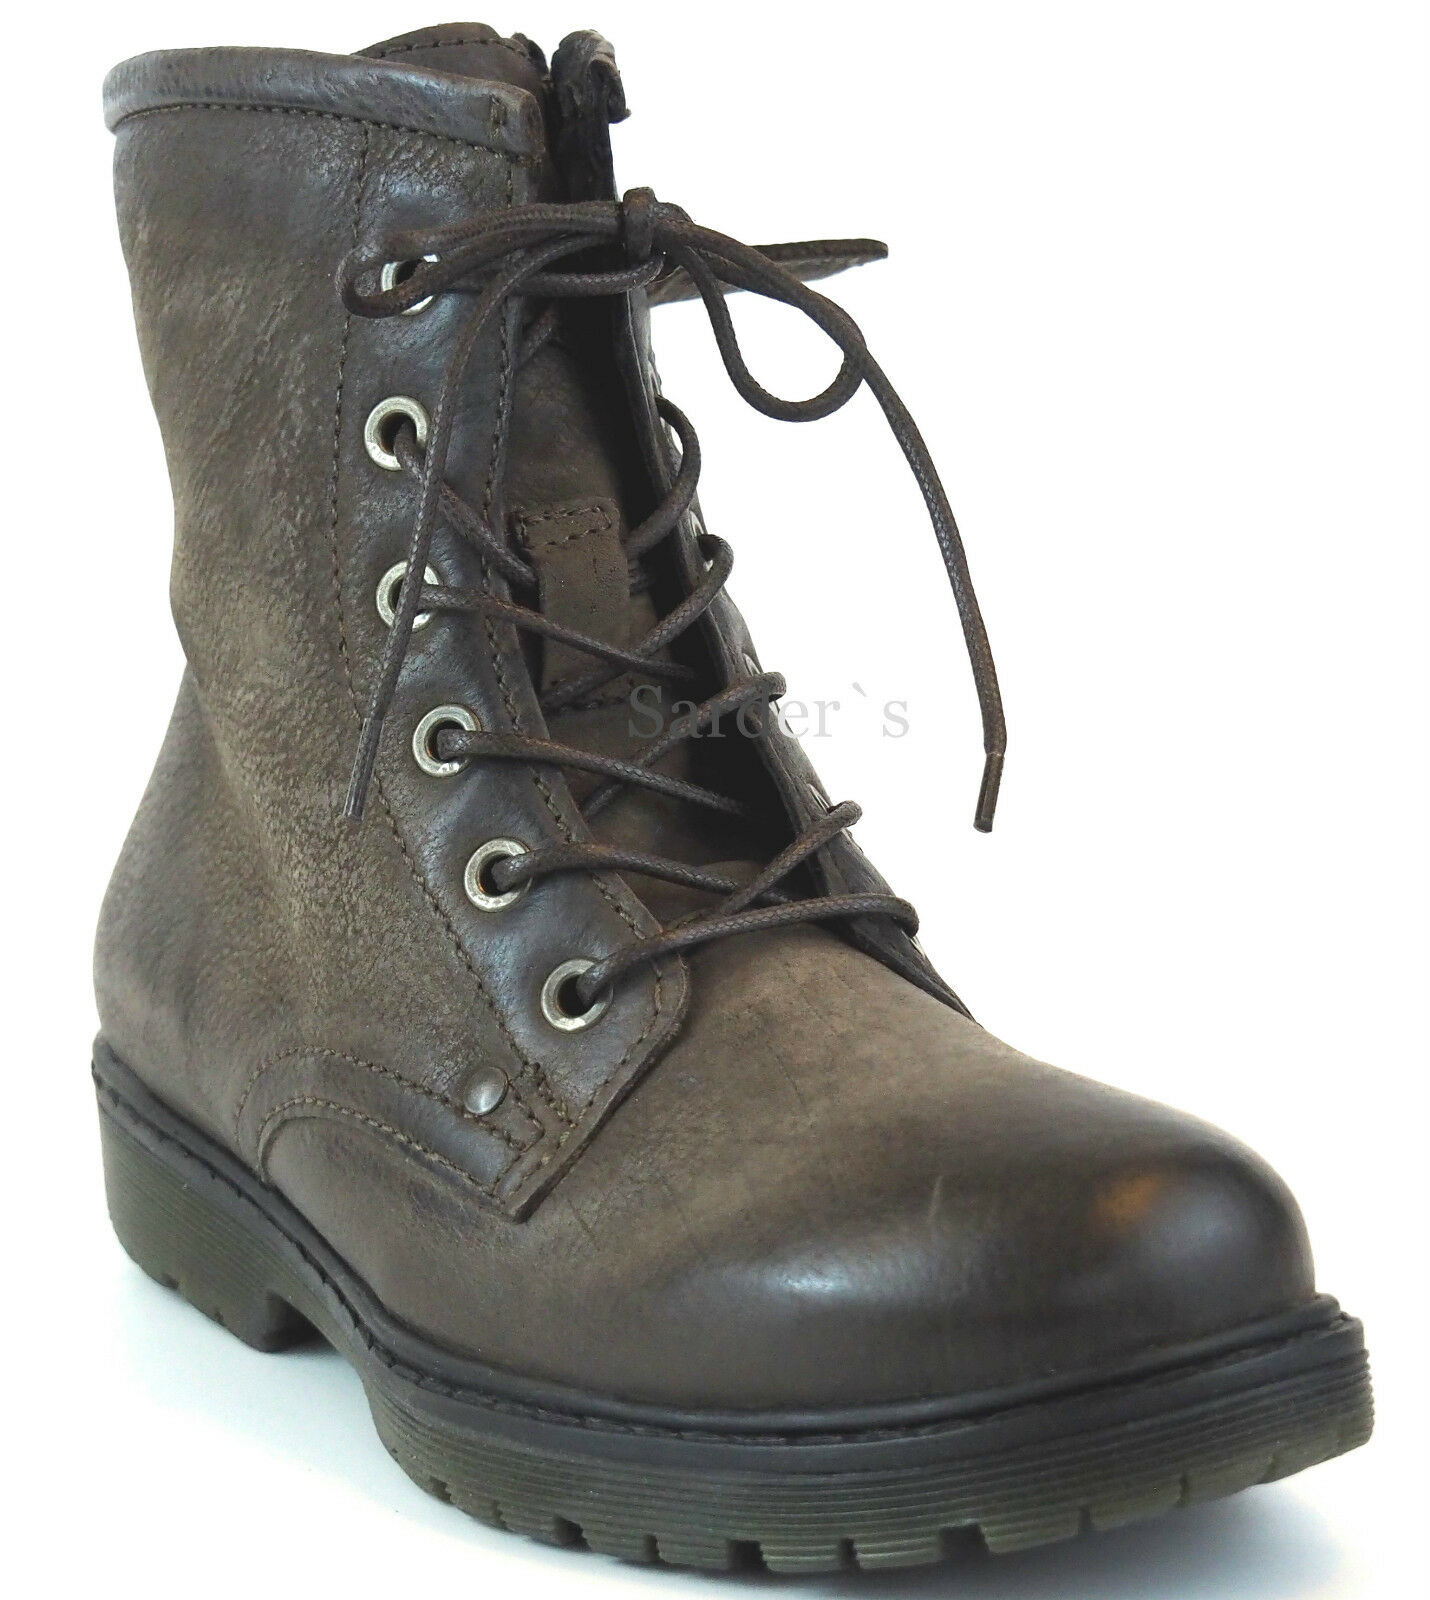 Mjus Italy Stiefelette 42 LEDER Taupe Antik Winter Boots Stiefel Stiefel Stiefel Lammfell NEU 6fab63